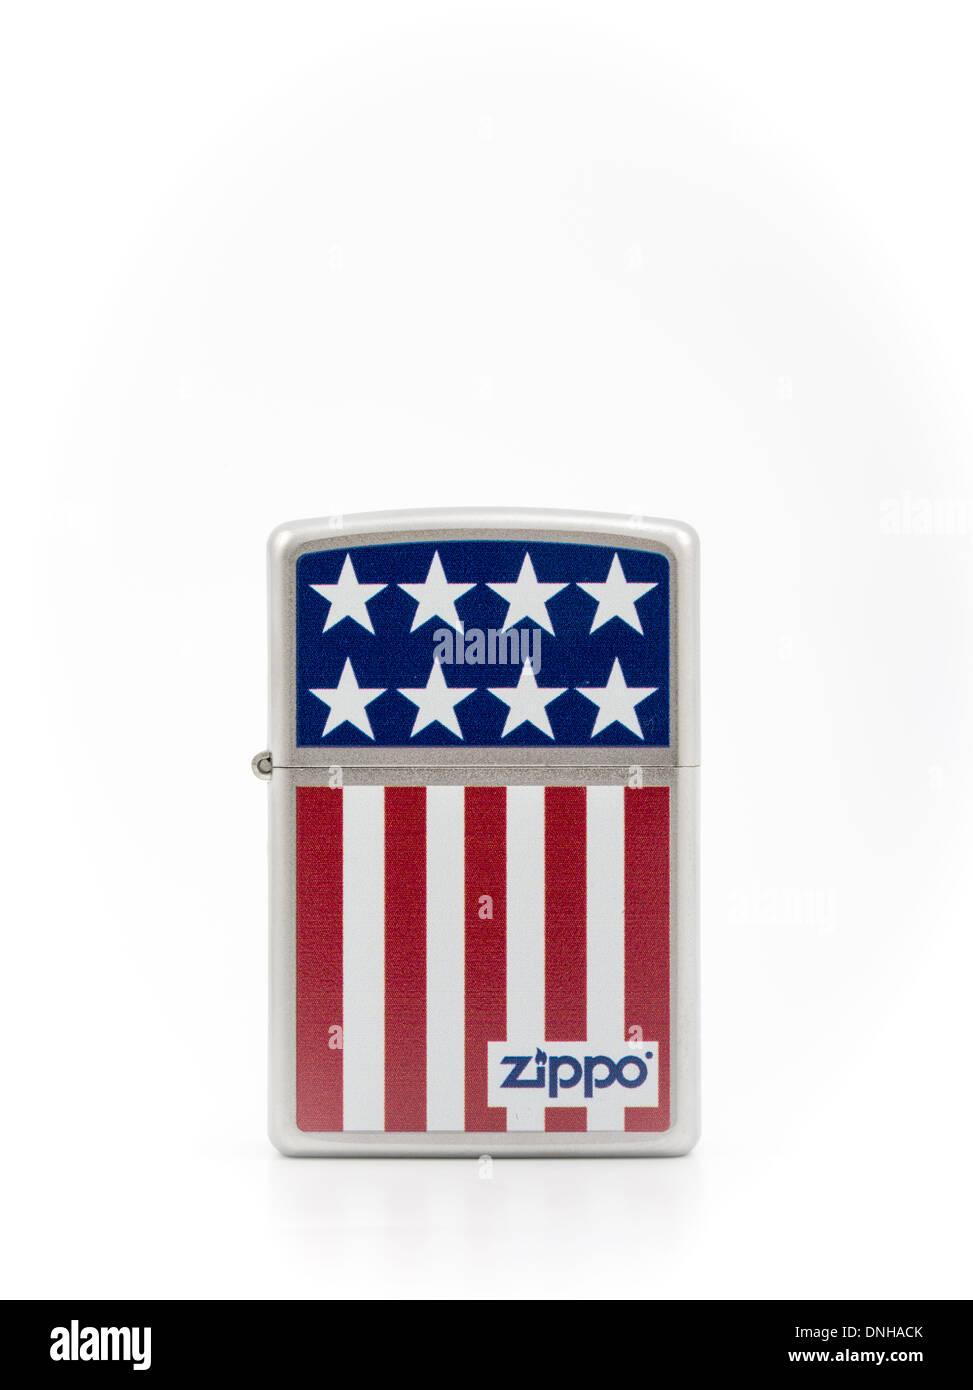 Zippo iconic cigarette lighter made in the USA Stars & Stripes design - Stock Image